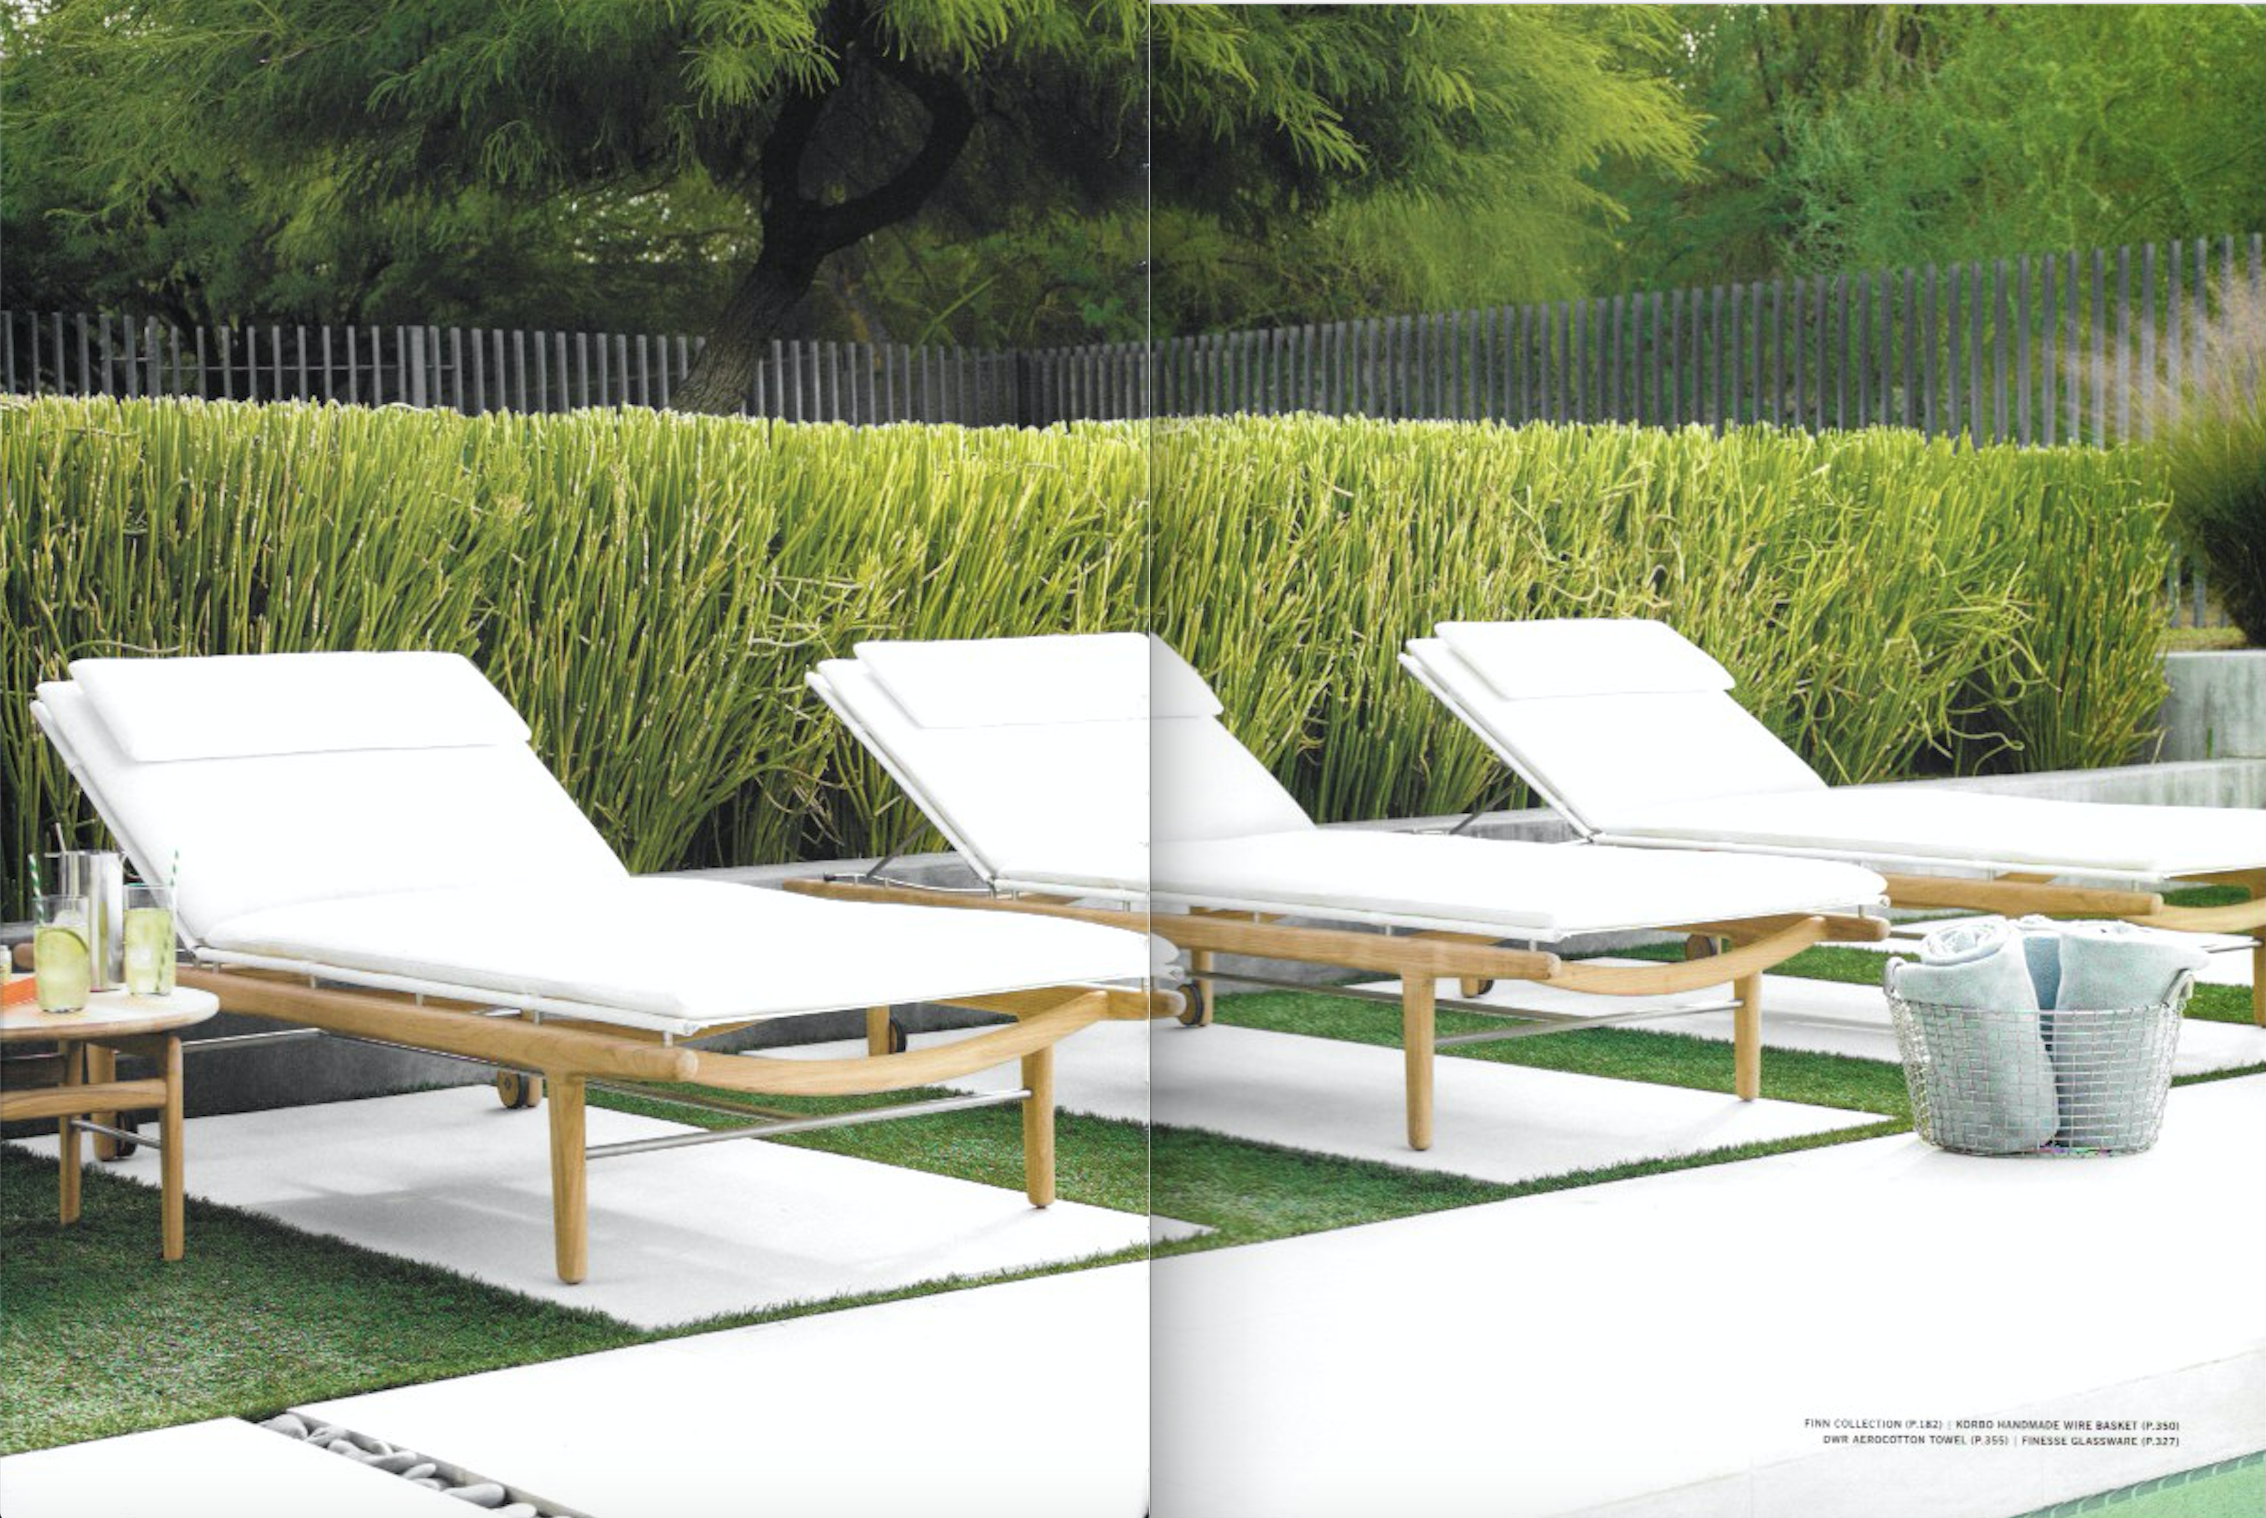 Photography: Jim Bastardo, Styling: Marcus Hay for SMH, Inc